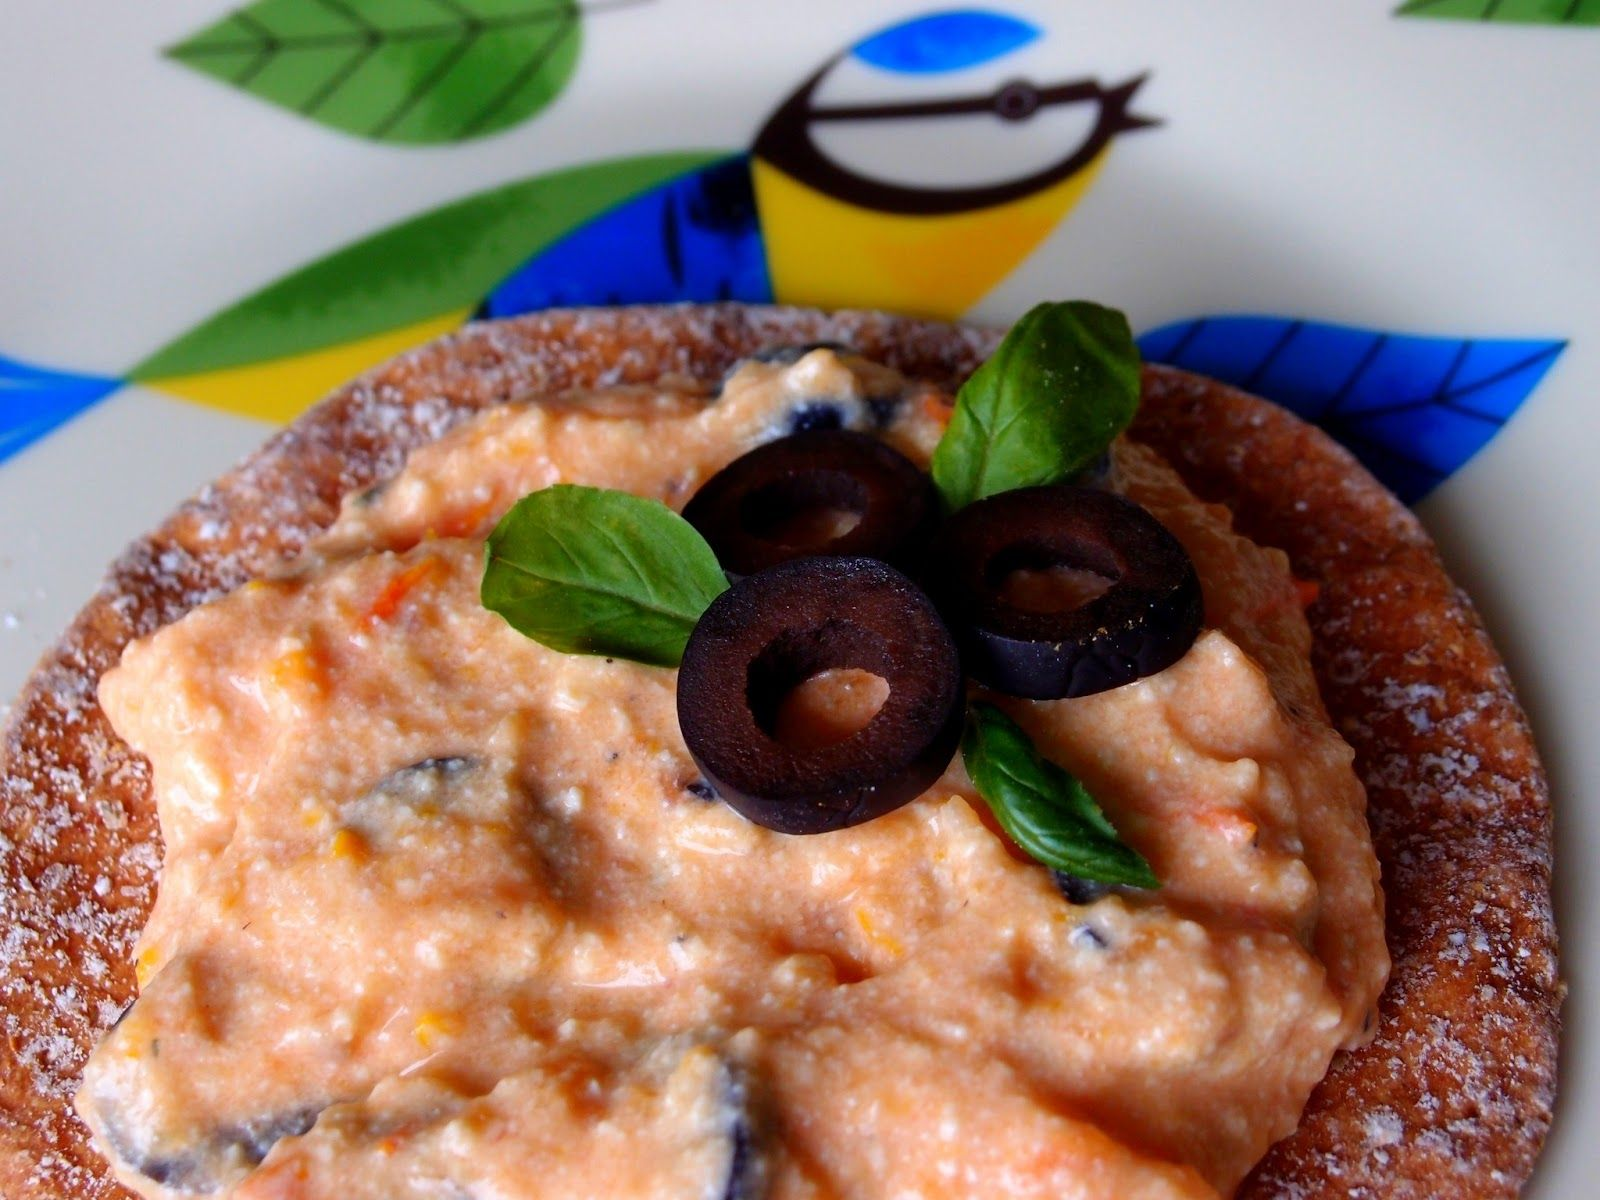 The VegHog: Vegan tomato and olive tofu spread